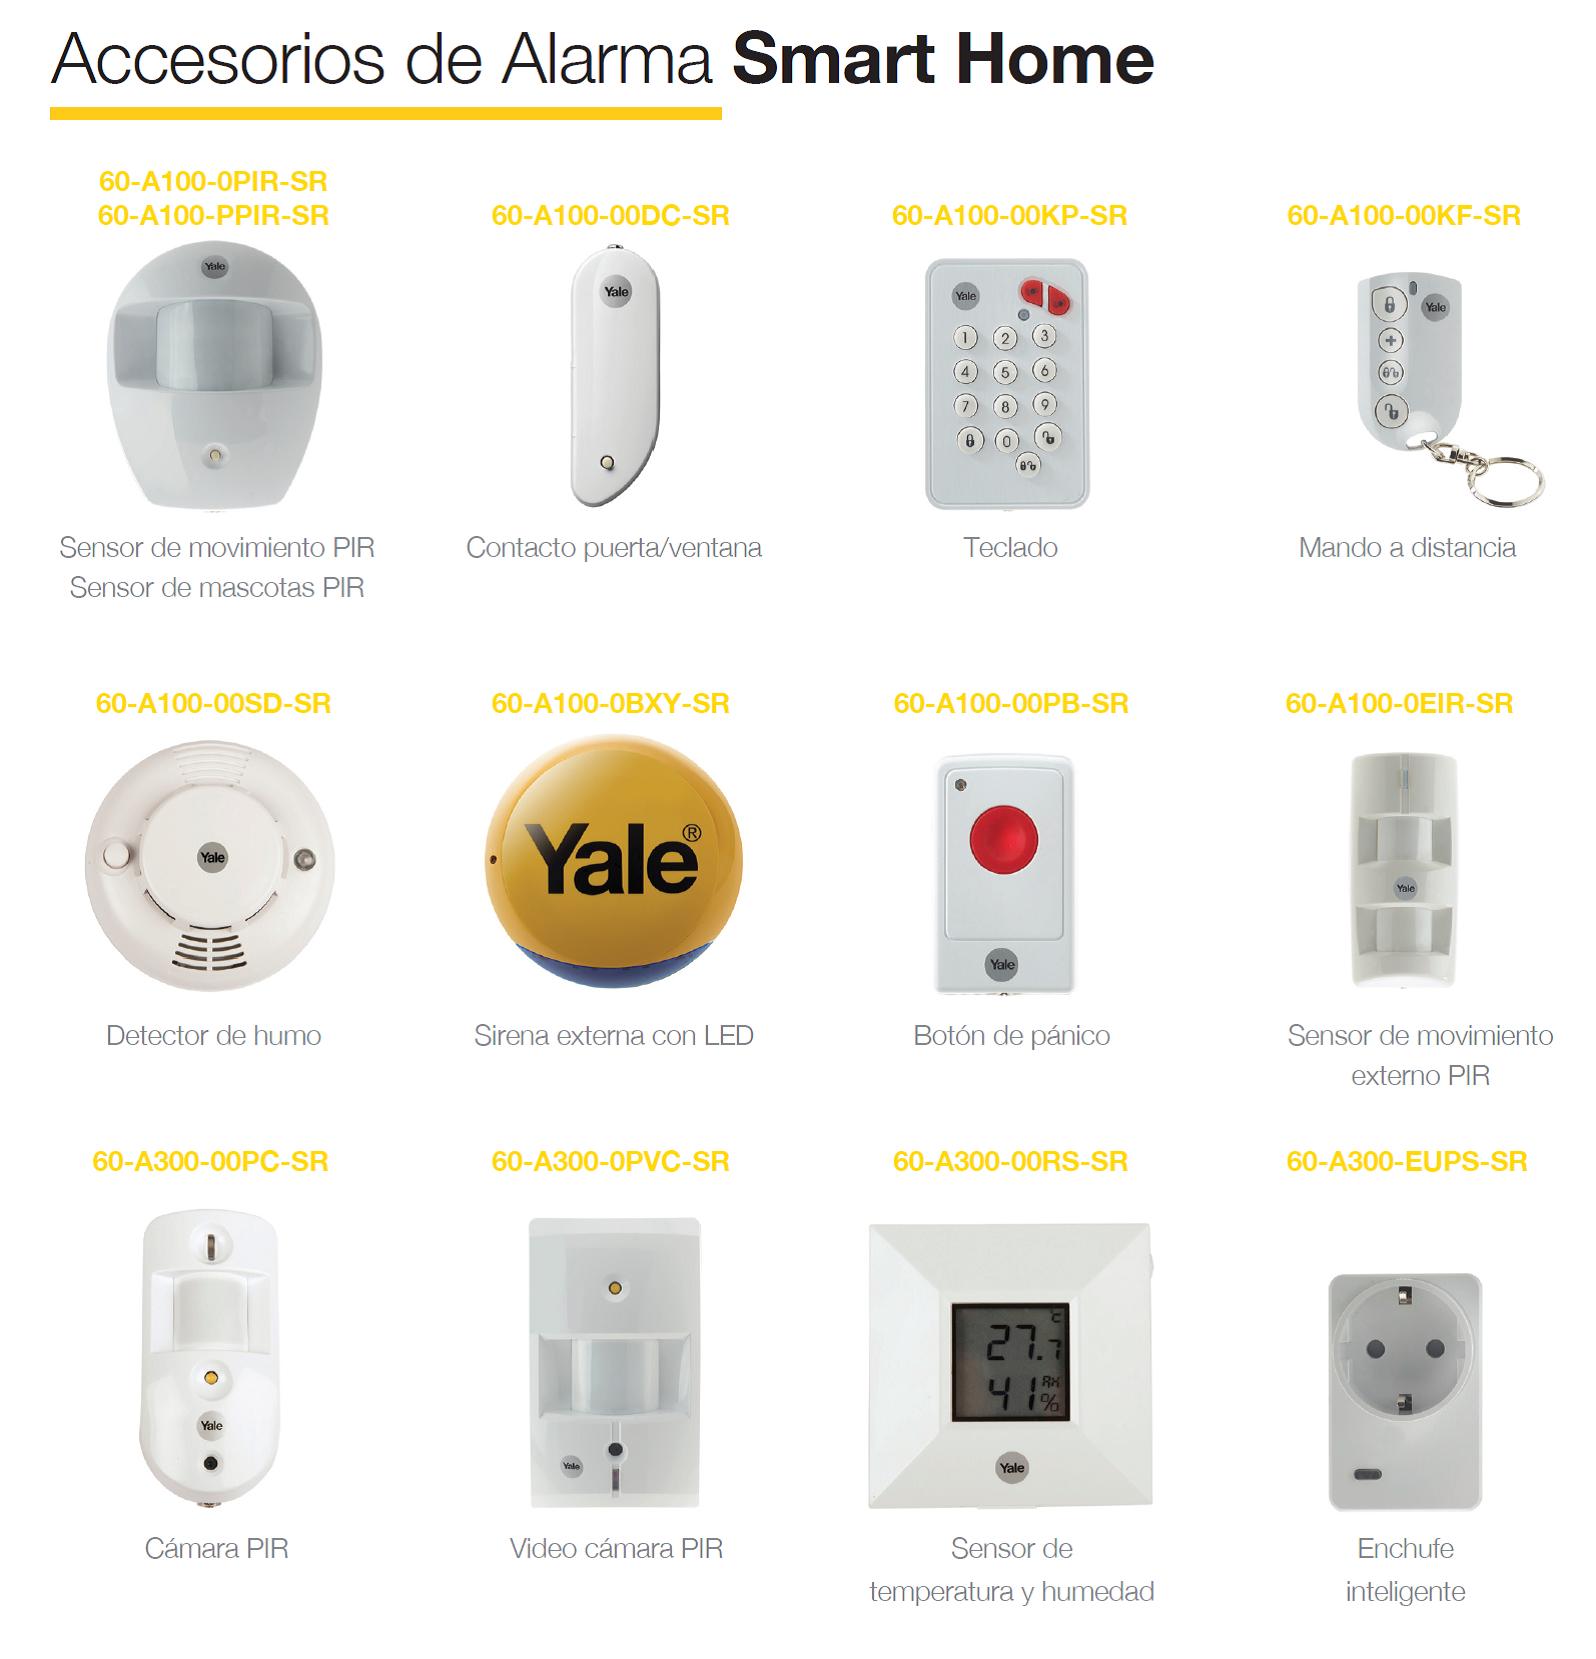 Accesorios de Alarma Smart Home